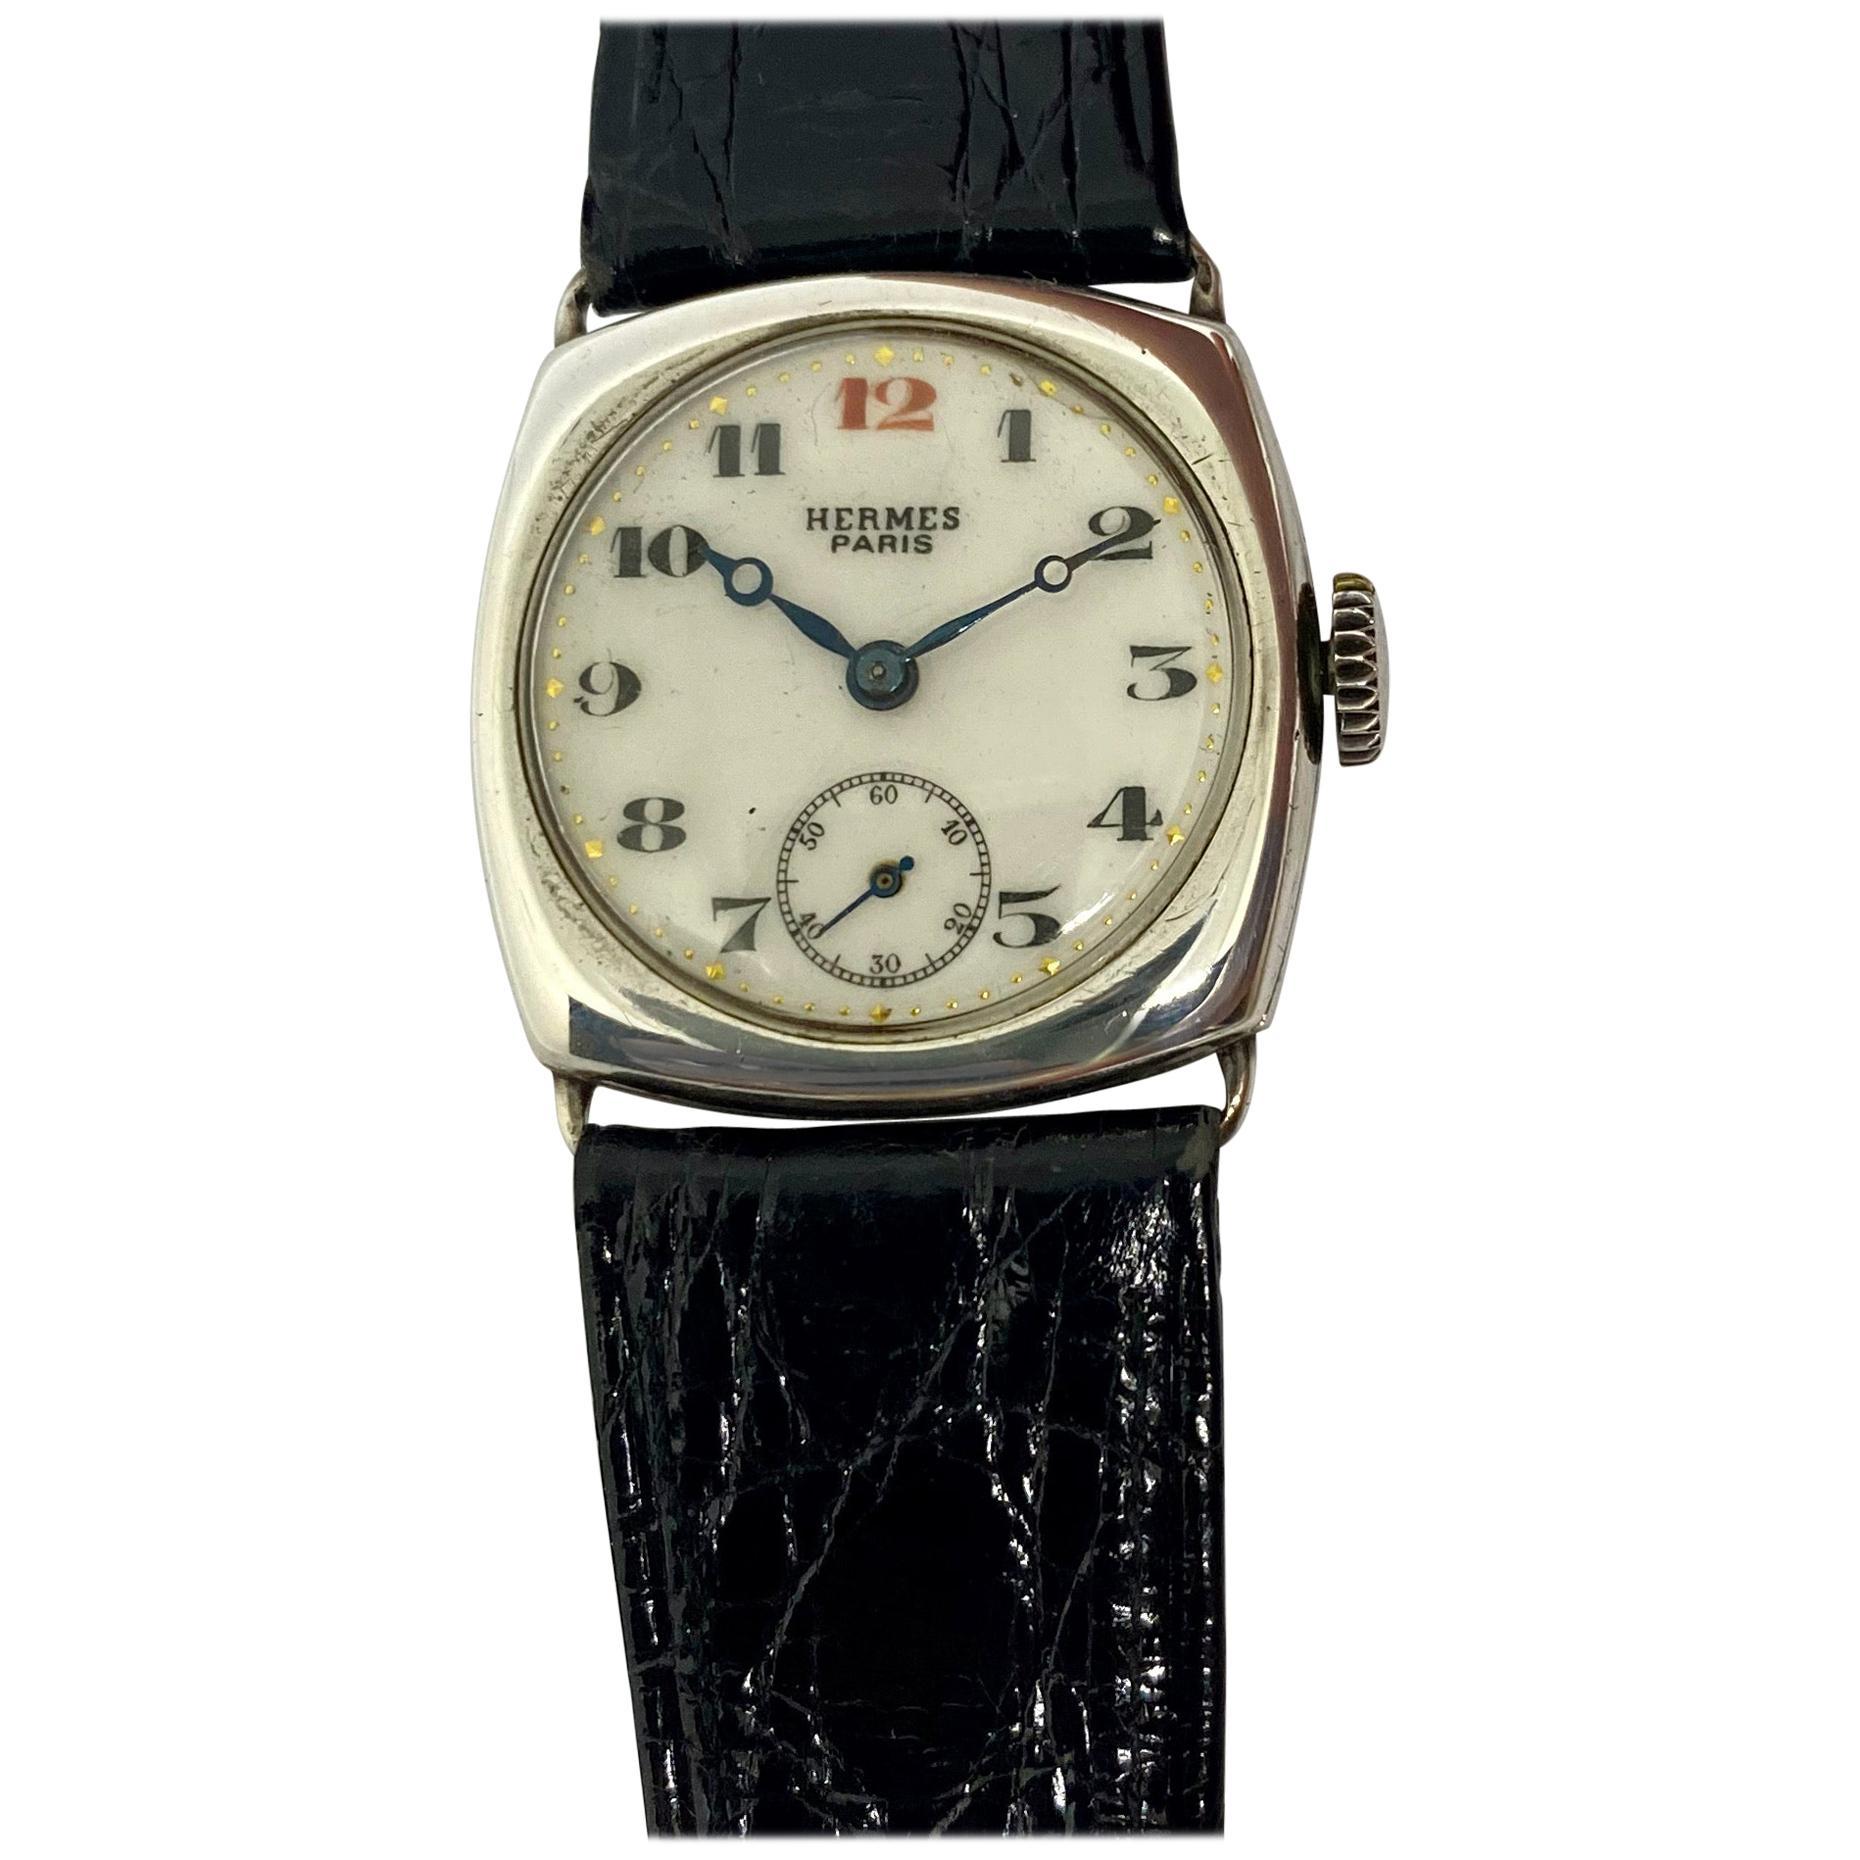 Hermes Paris Collector's Wristwatch